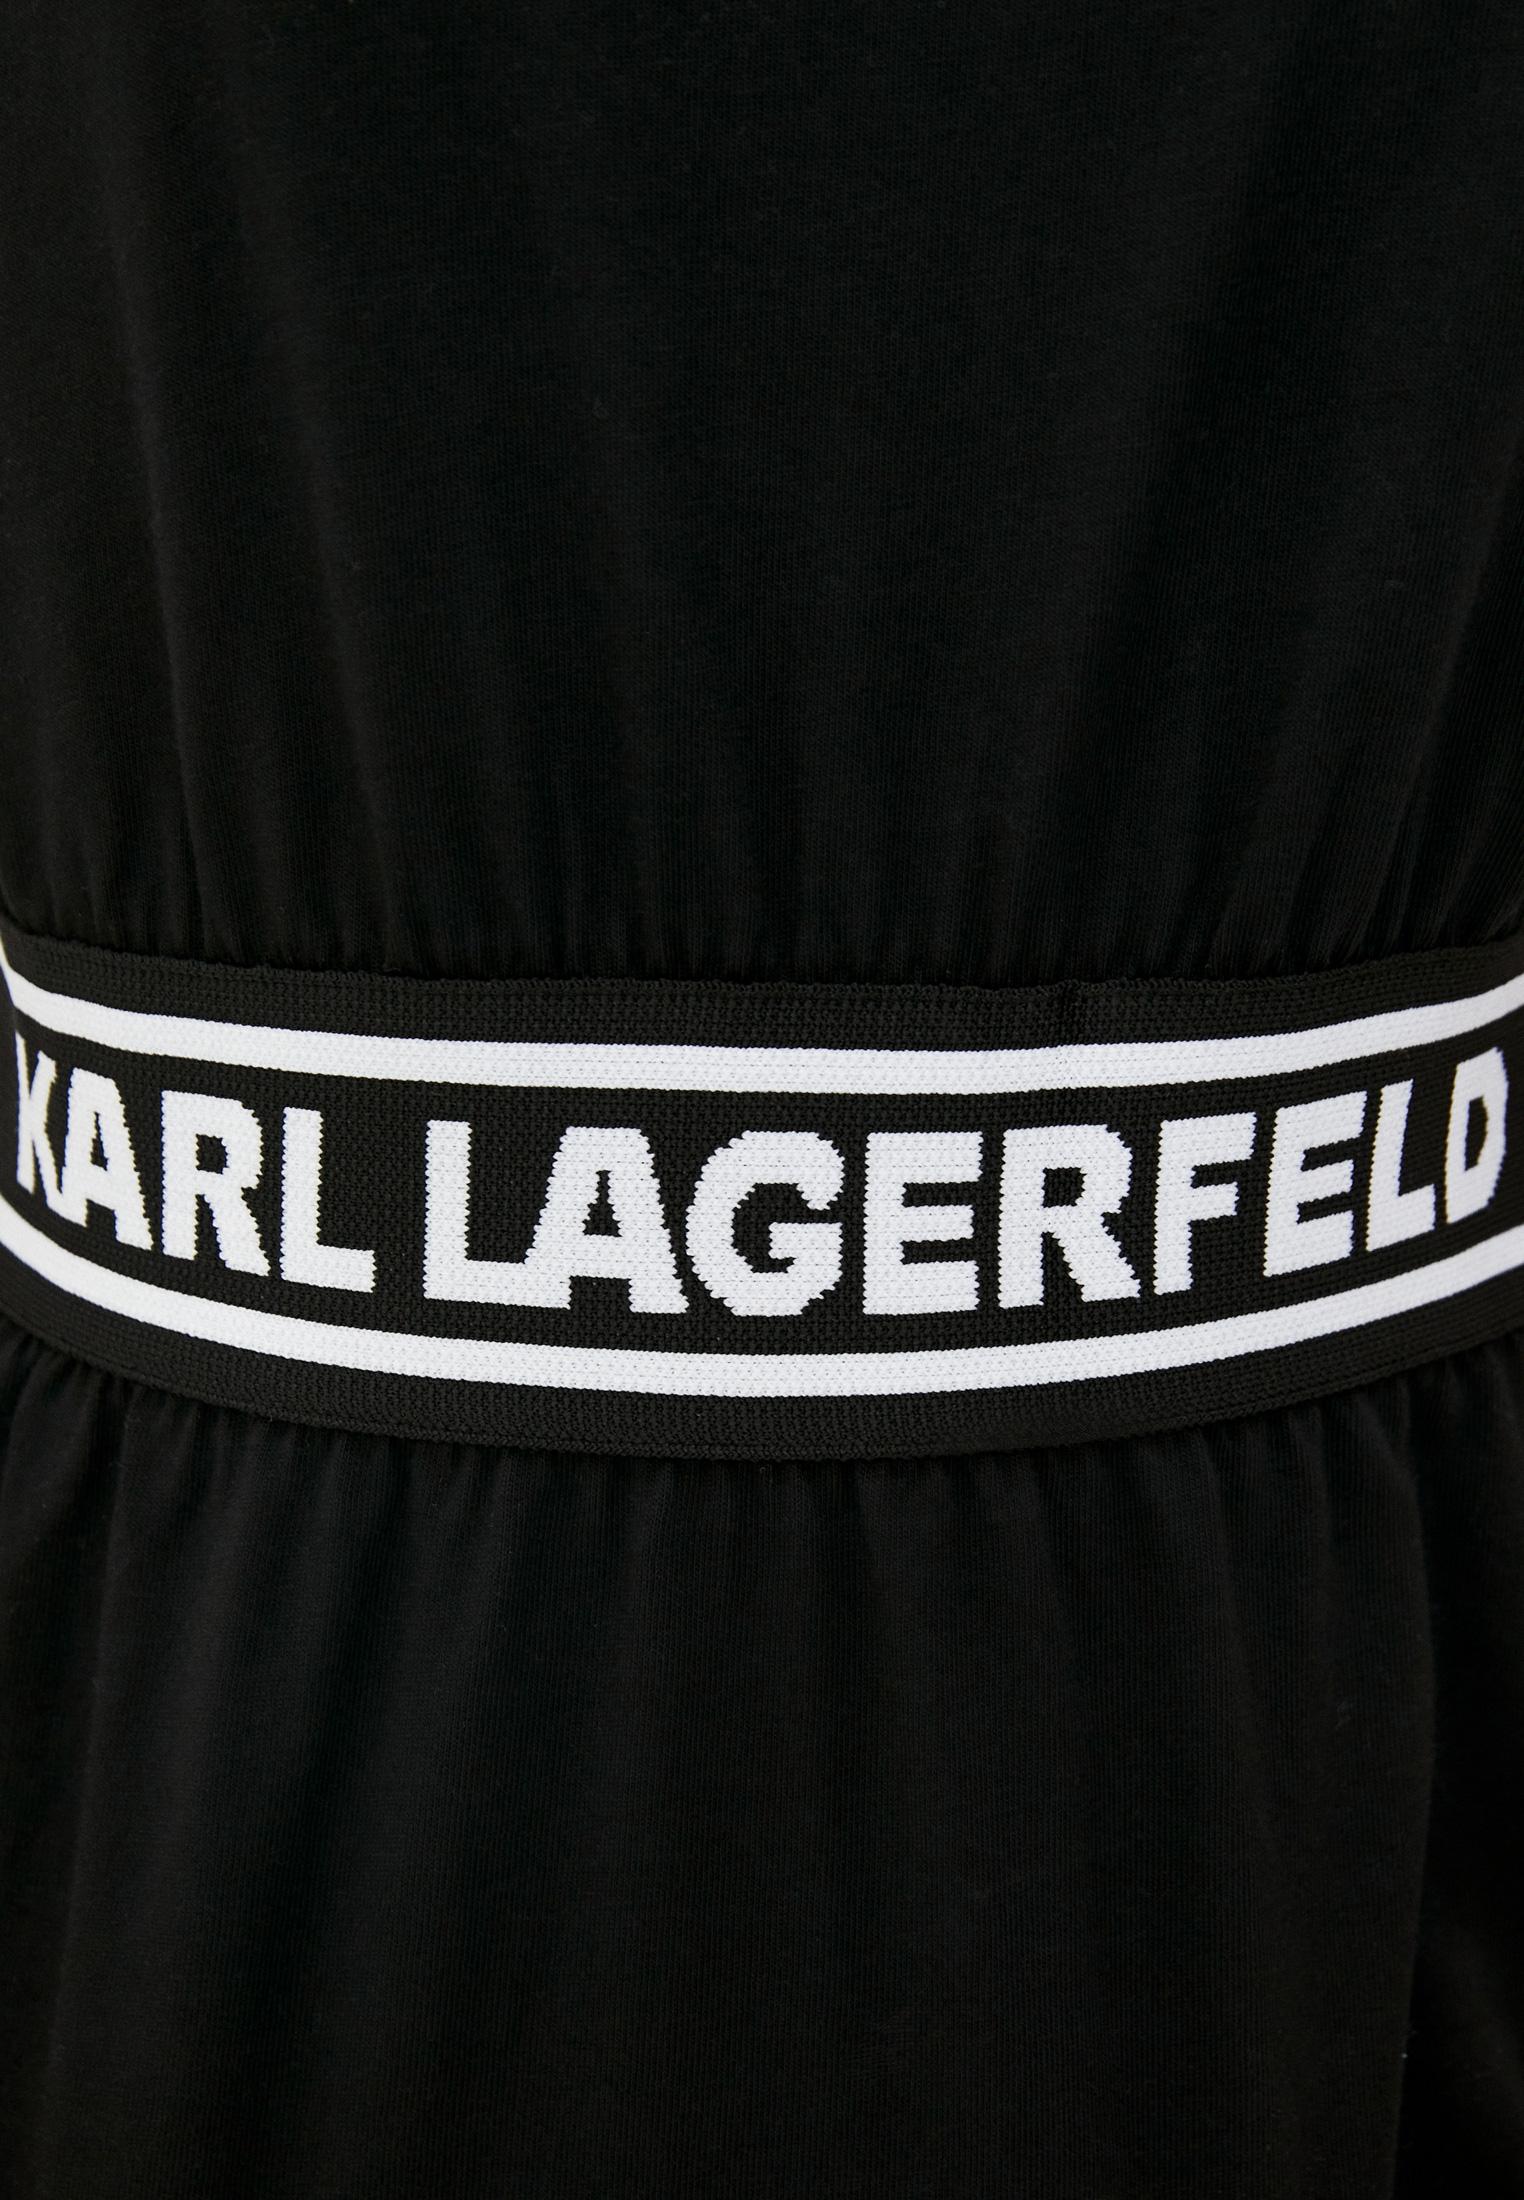 Футболка с коротким рукавом Karl Lagerfeld 211W1705: изображение 5